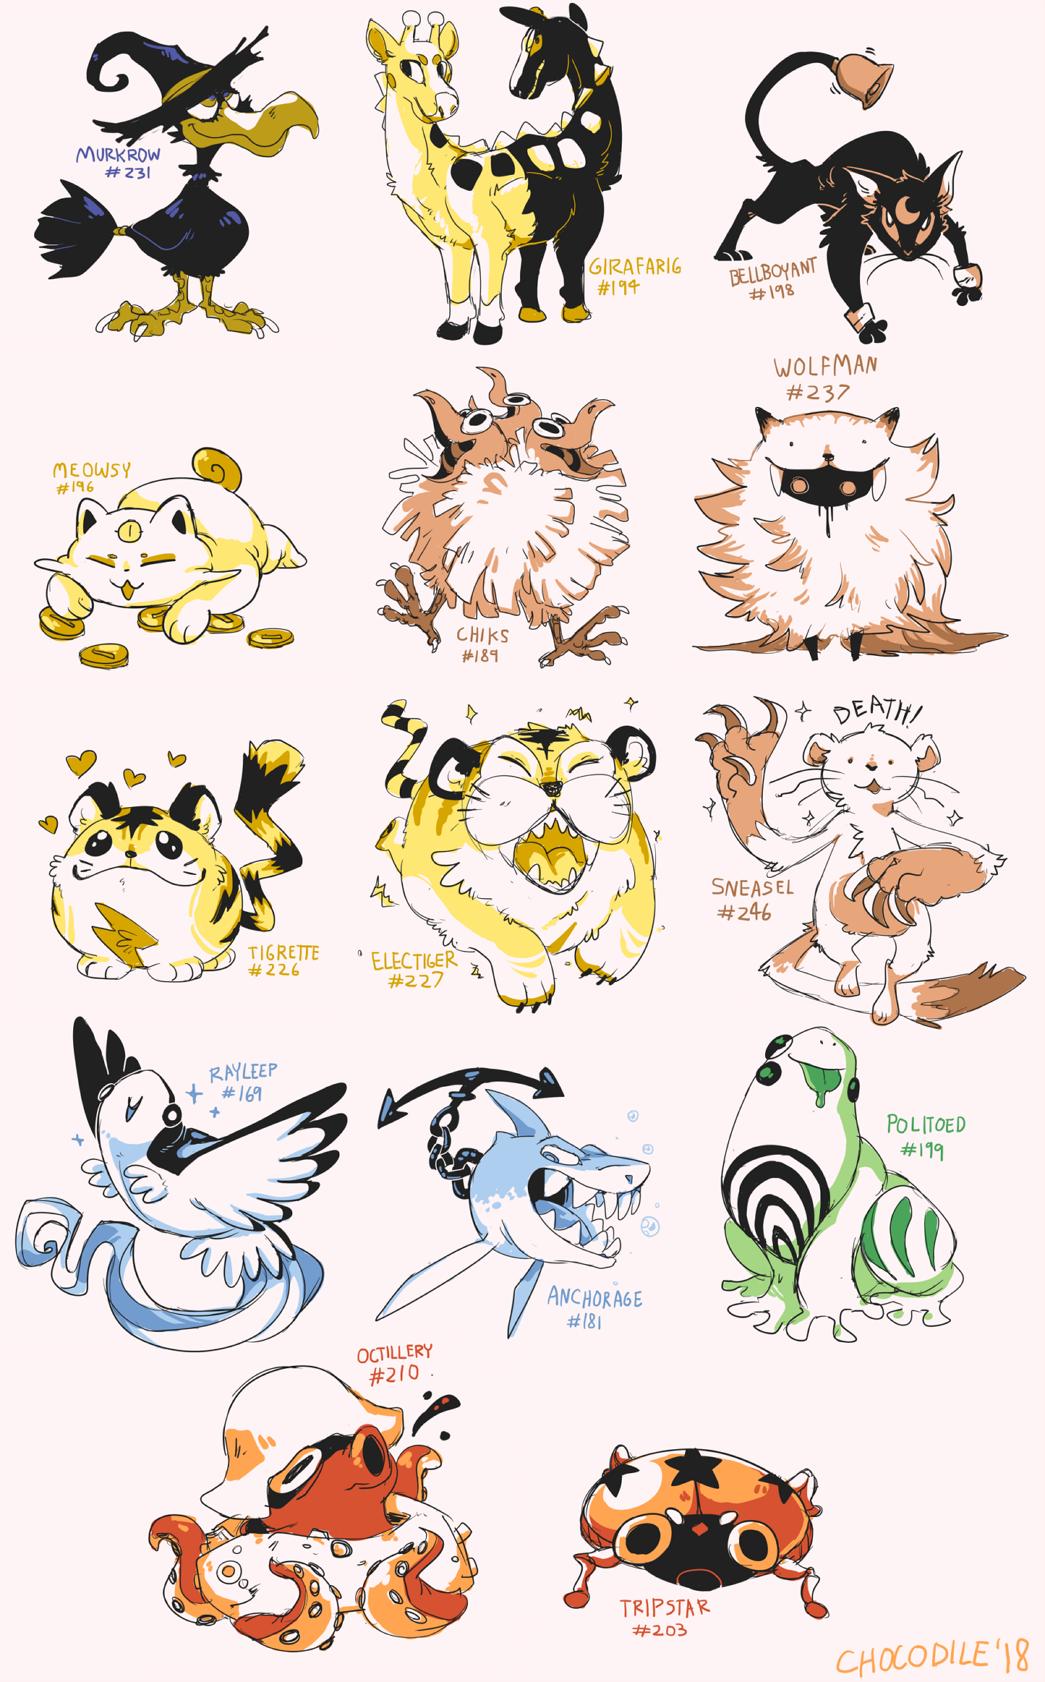 chocodiley gen_2_pokemon girafarig highres murkrow octillery pokemon politoed sneasel wolfman